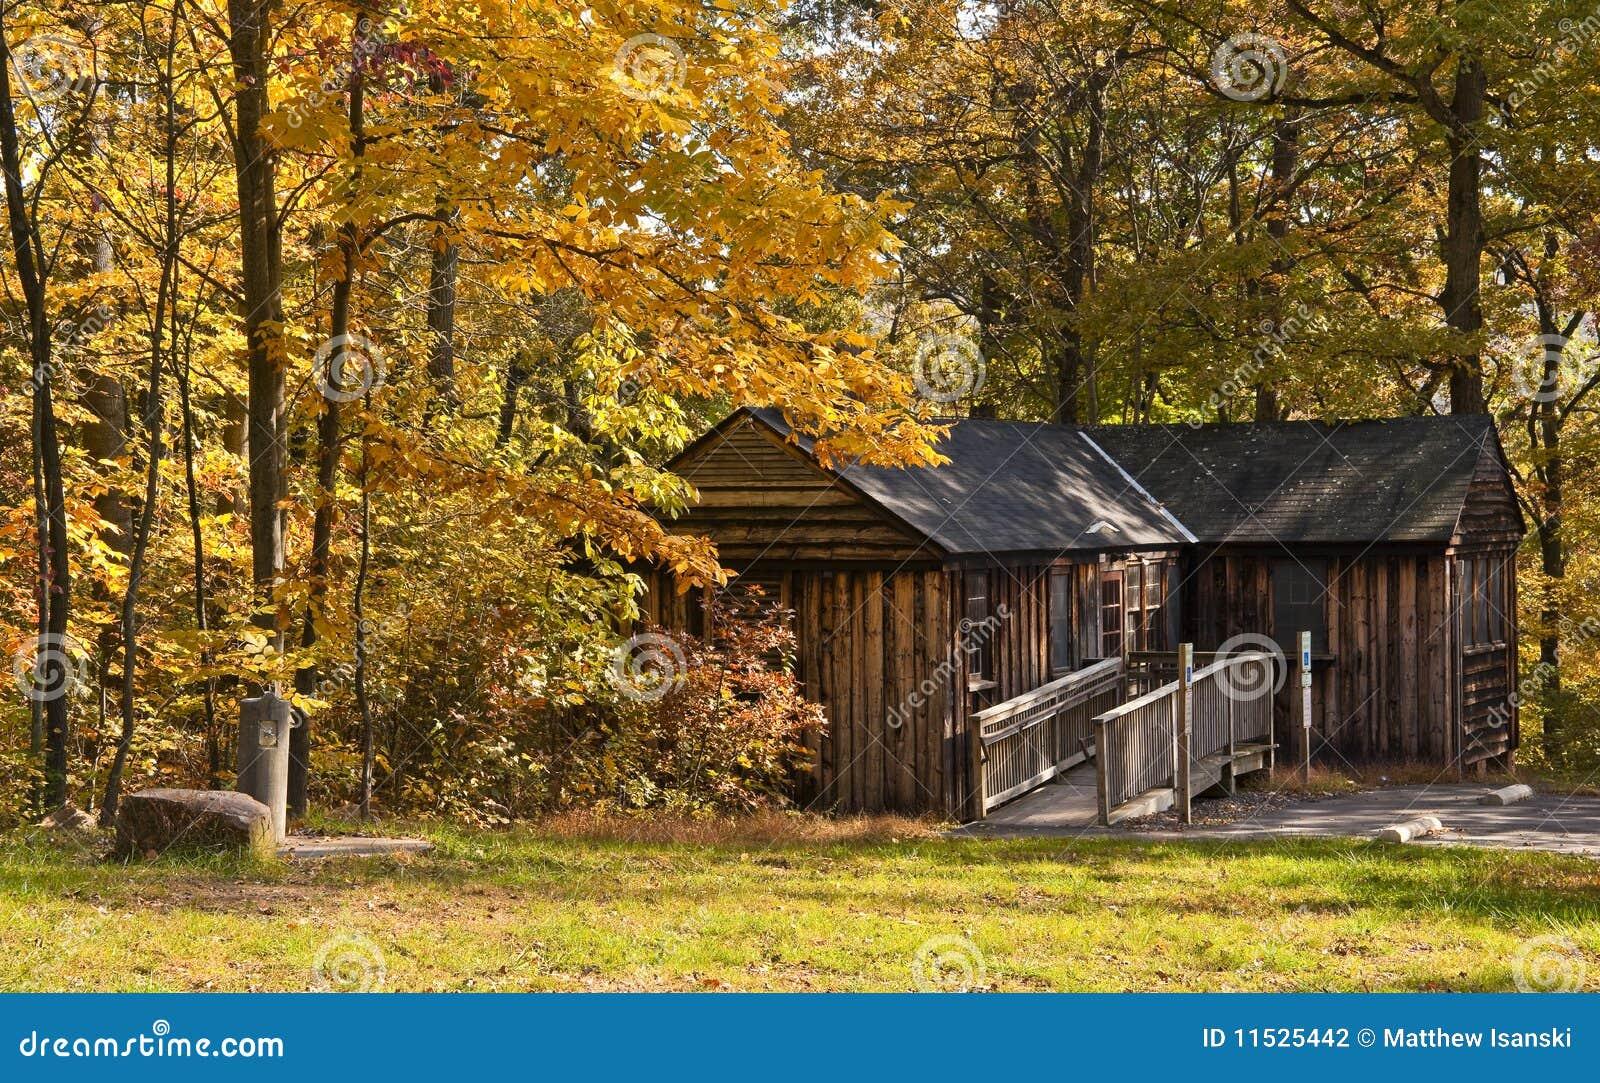 Rustic Rental Cabin Stock Photo Image Of Leaves Rustic